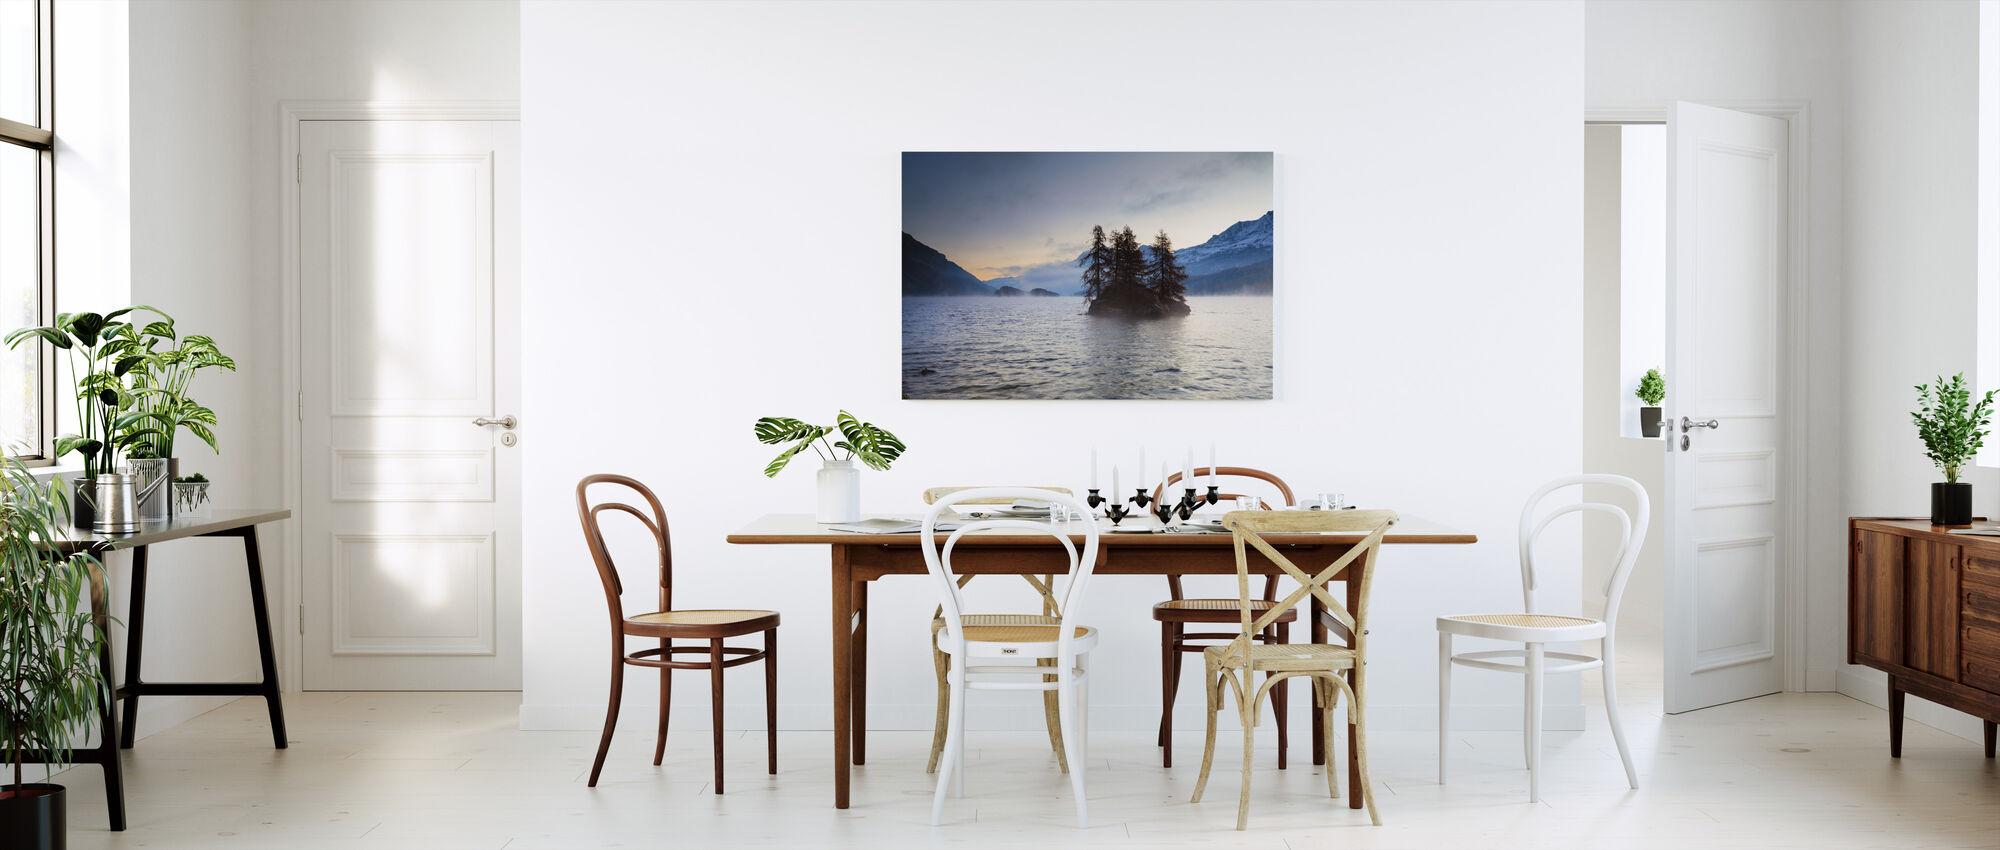 Island in Lake Sils - Canvas print - Kitchen